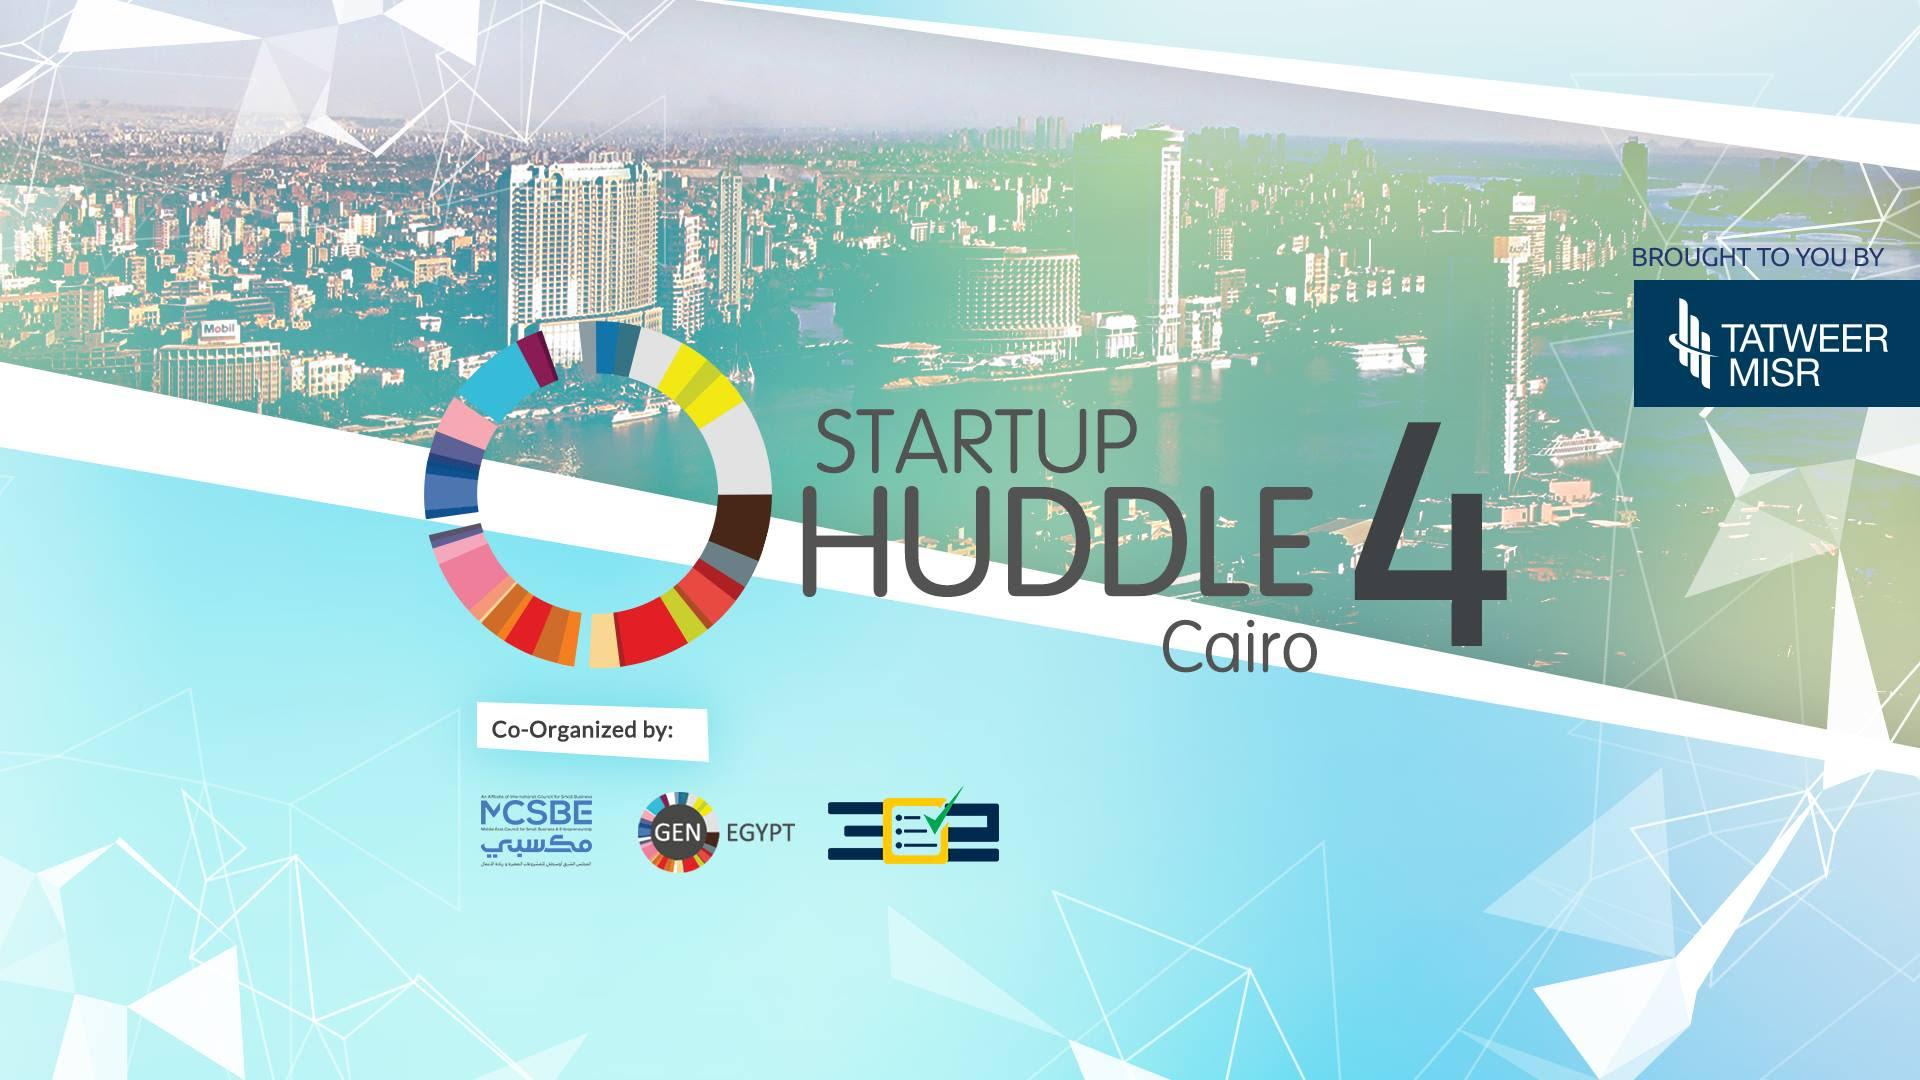 Startup Huddle Cairo 4